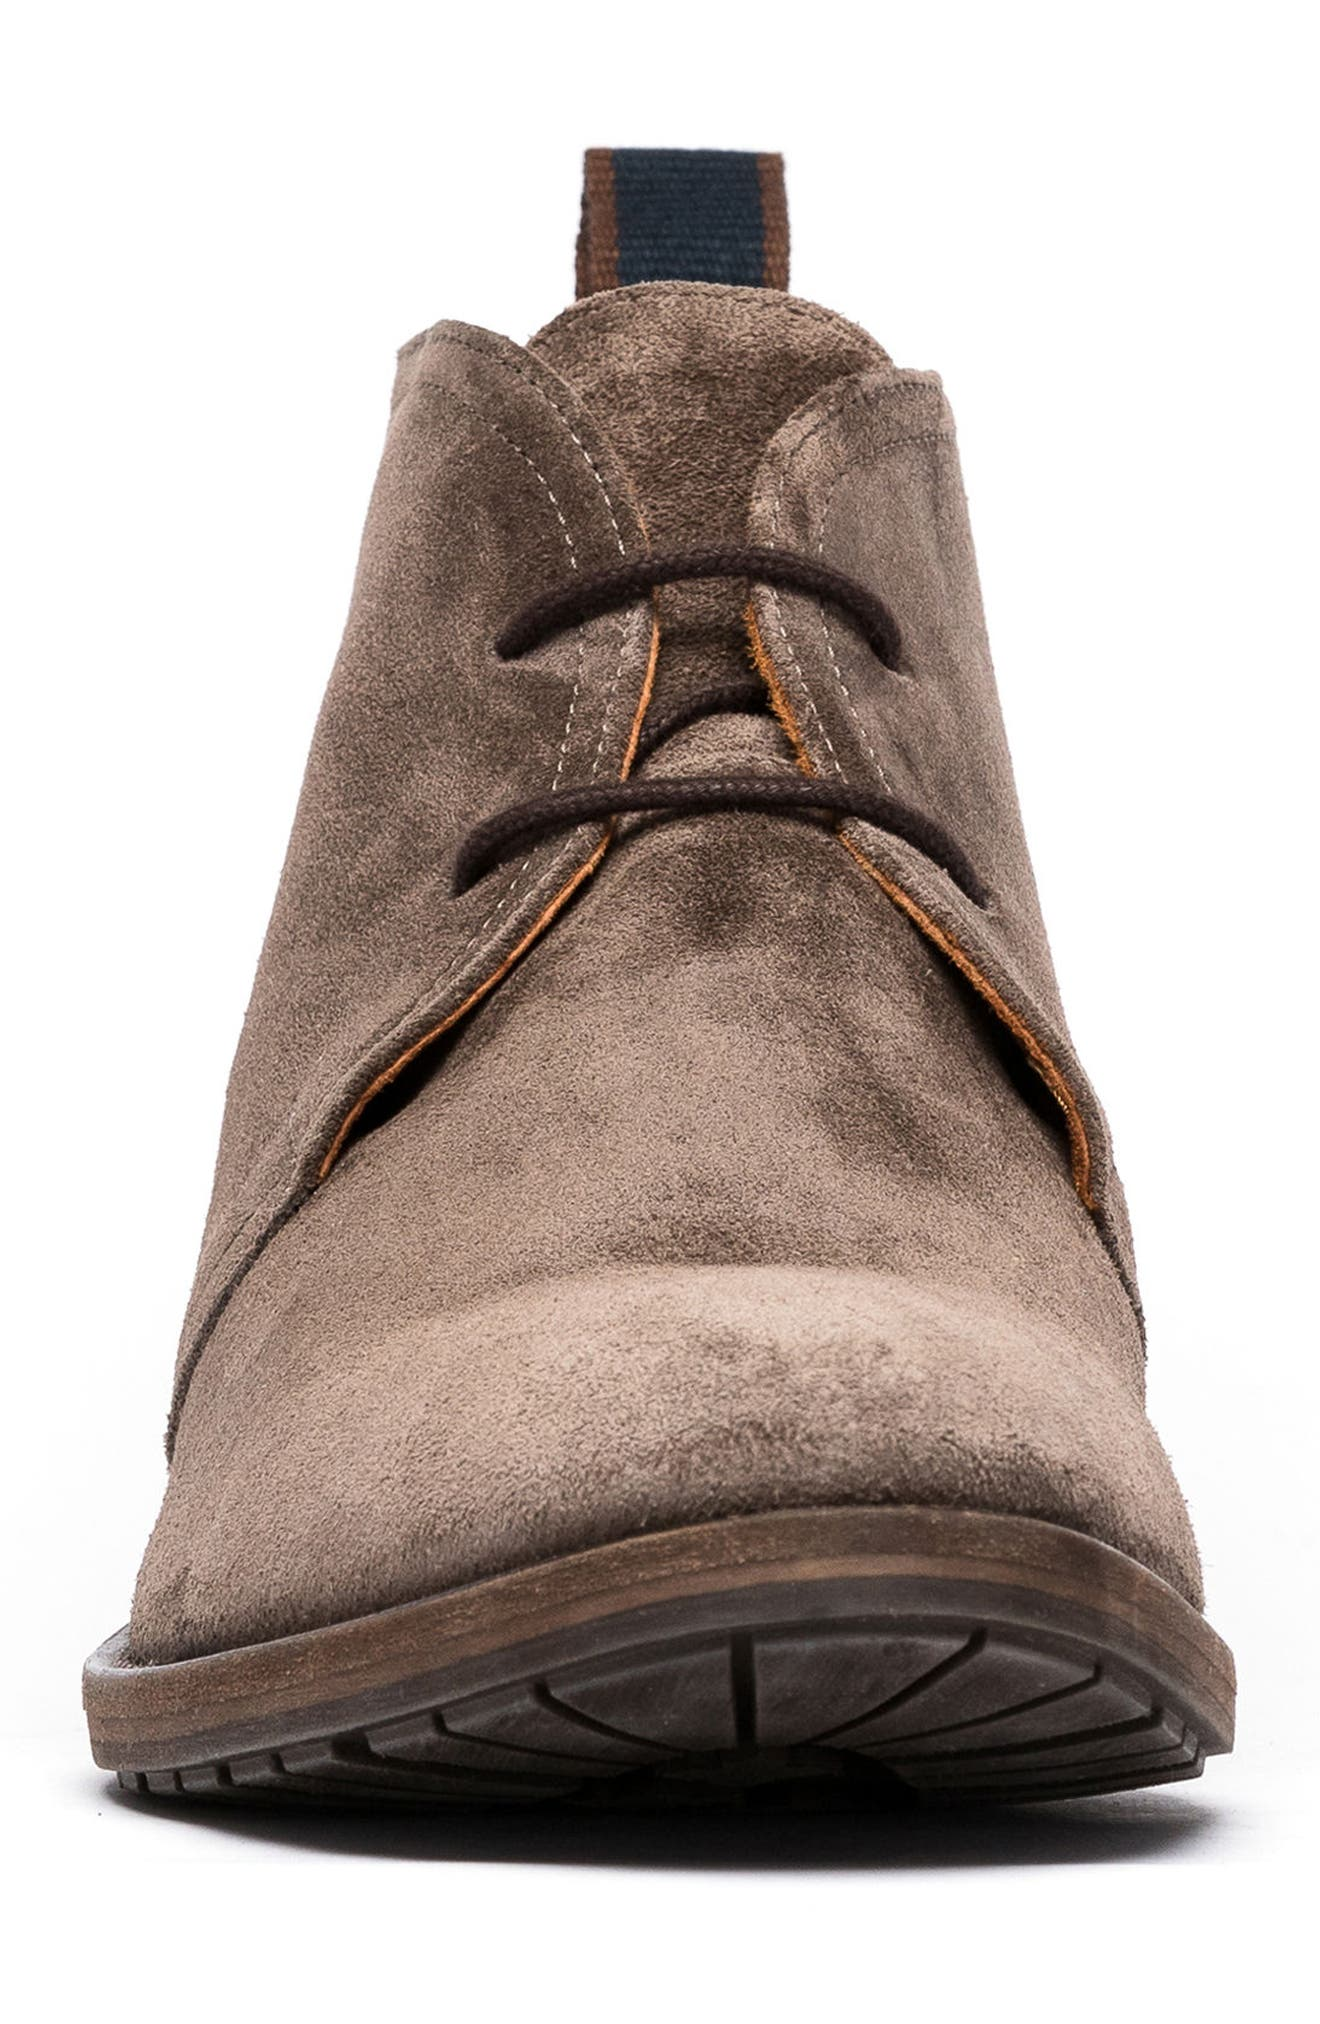 RODD & GUNN, Pebbly Hill Chukka Boot, Alternate thumbnail 4, color, TAUPE